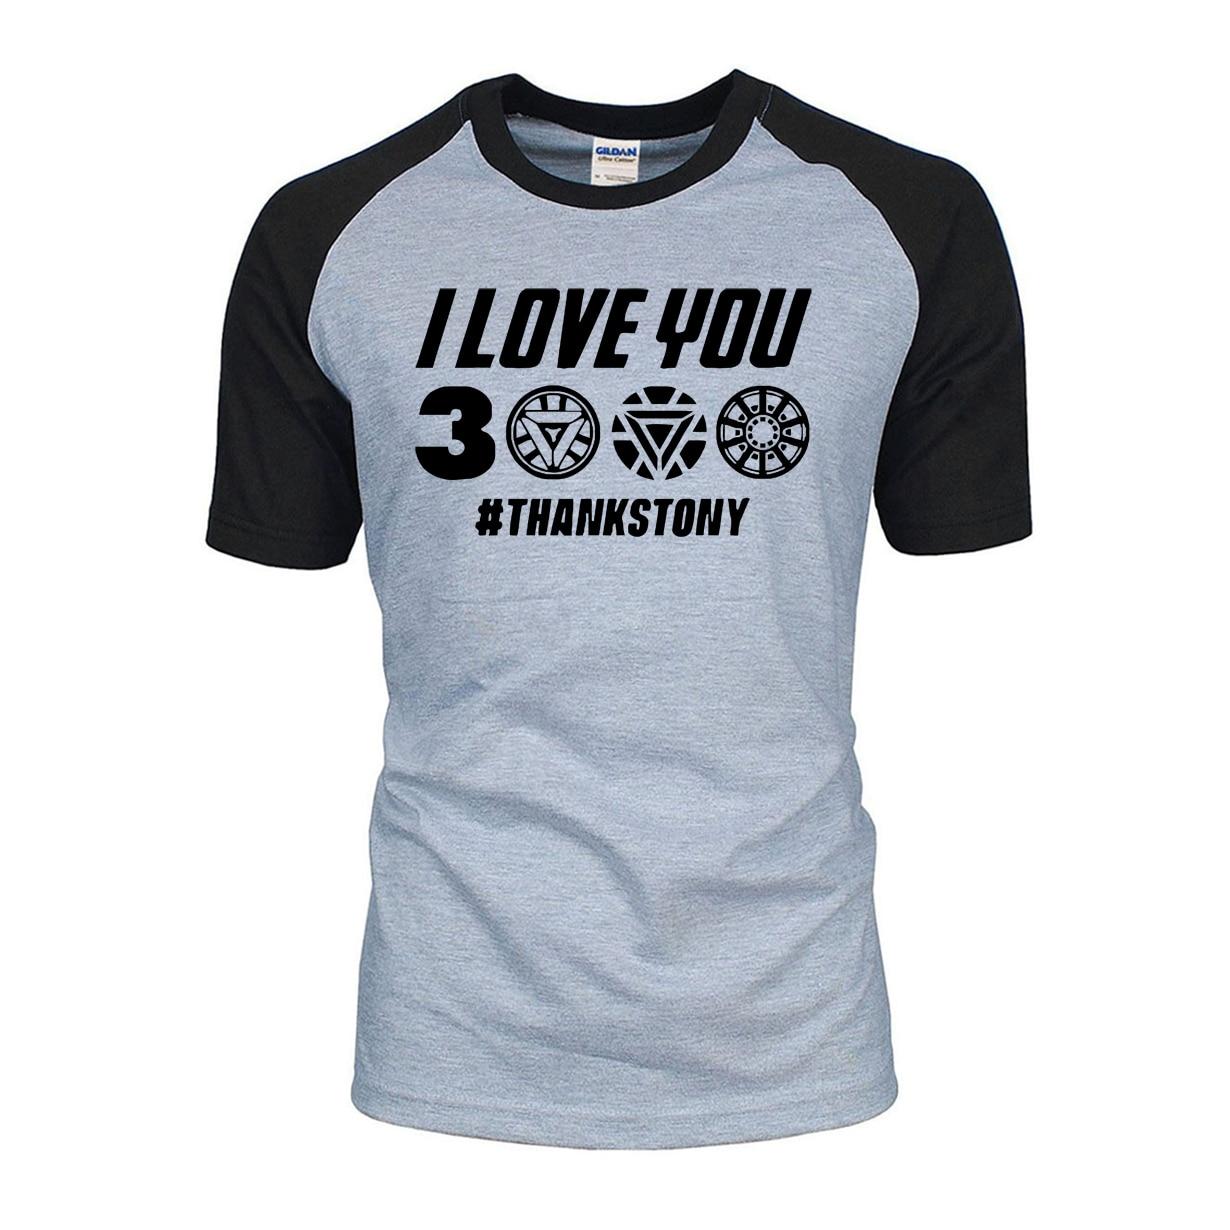 The Avengers 4 I Love You 3000   T  -  Shirt   Men Thanks Tony Stark Iron Man 2019 New Summer Raglan   T     Shirts   Brand Tops For Fans BZ065